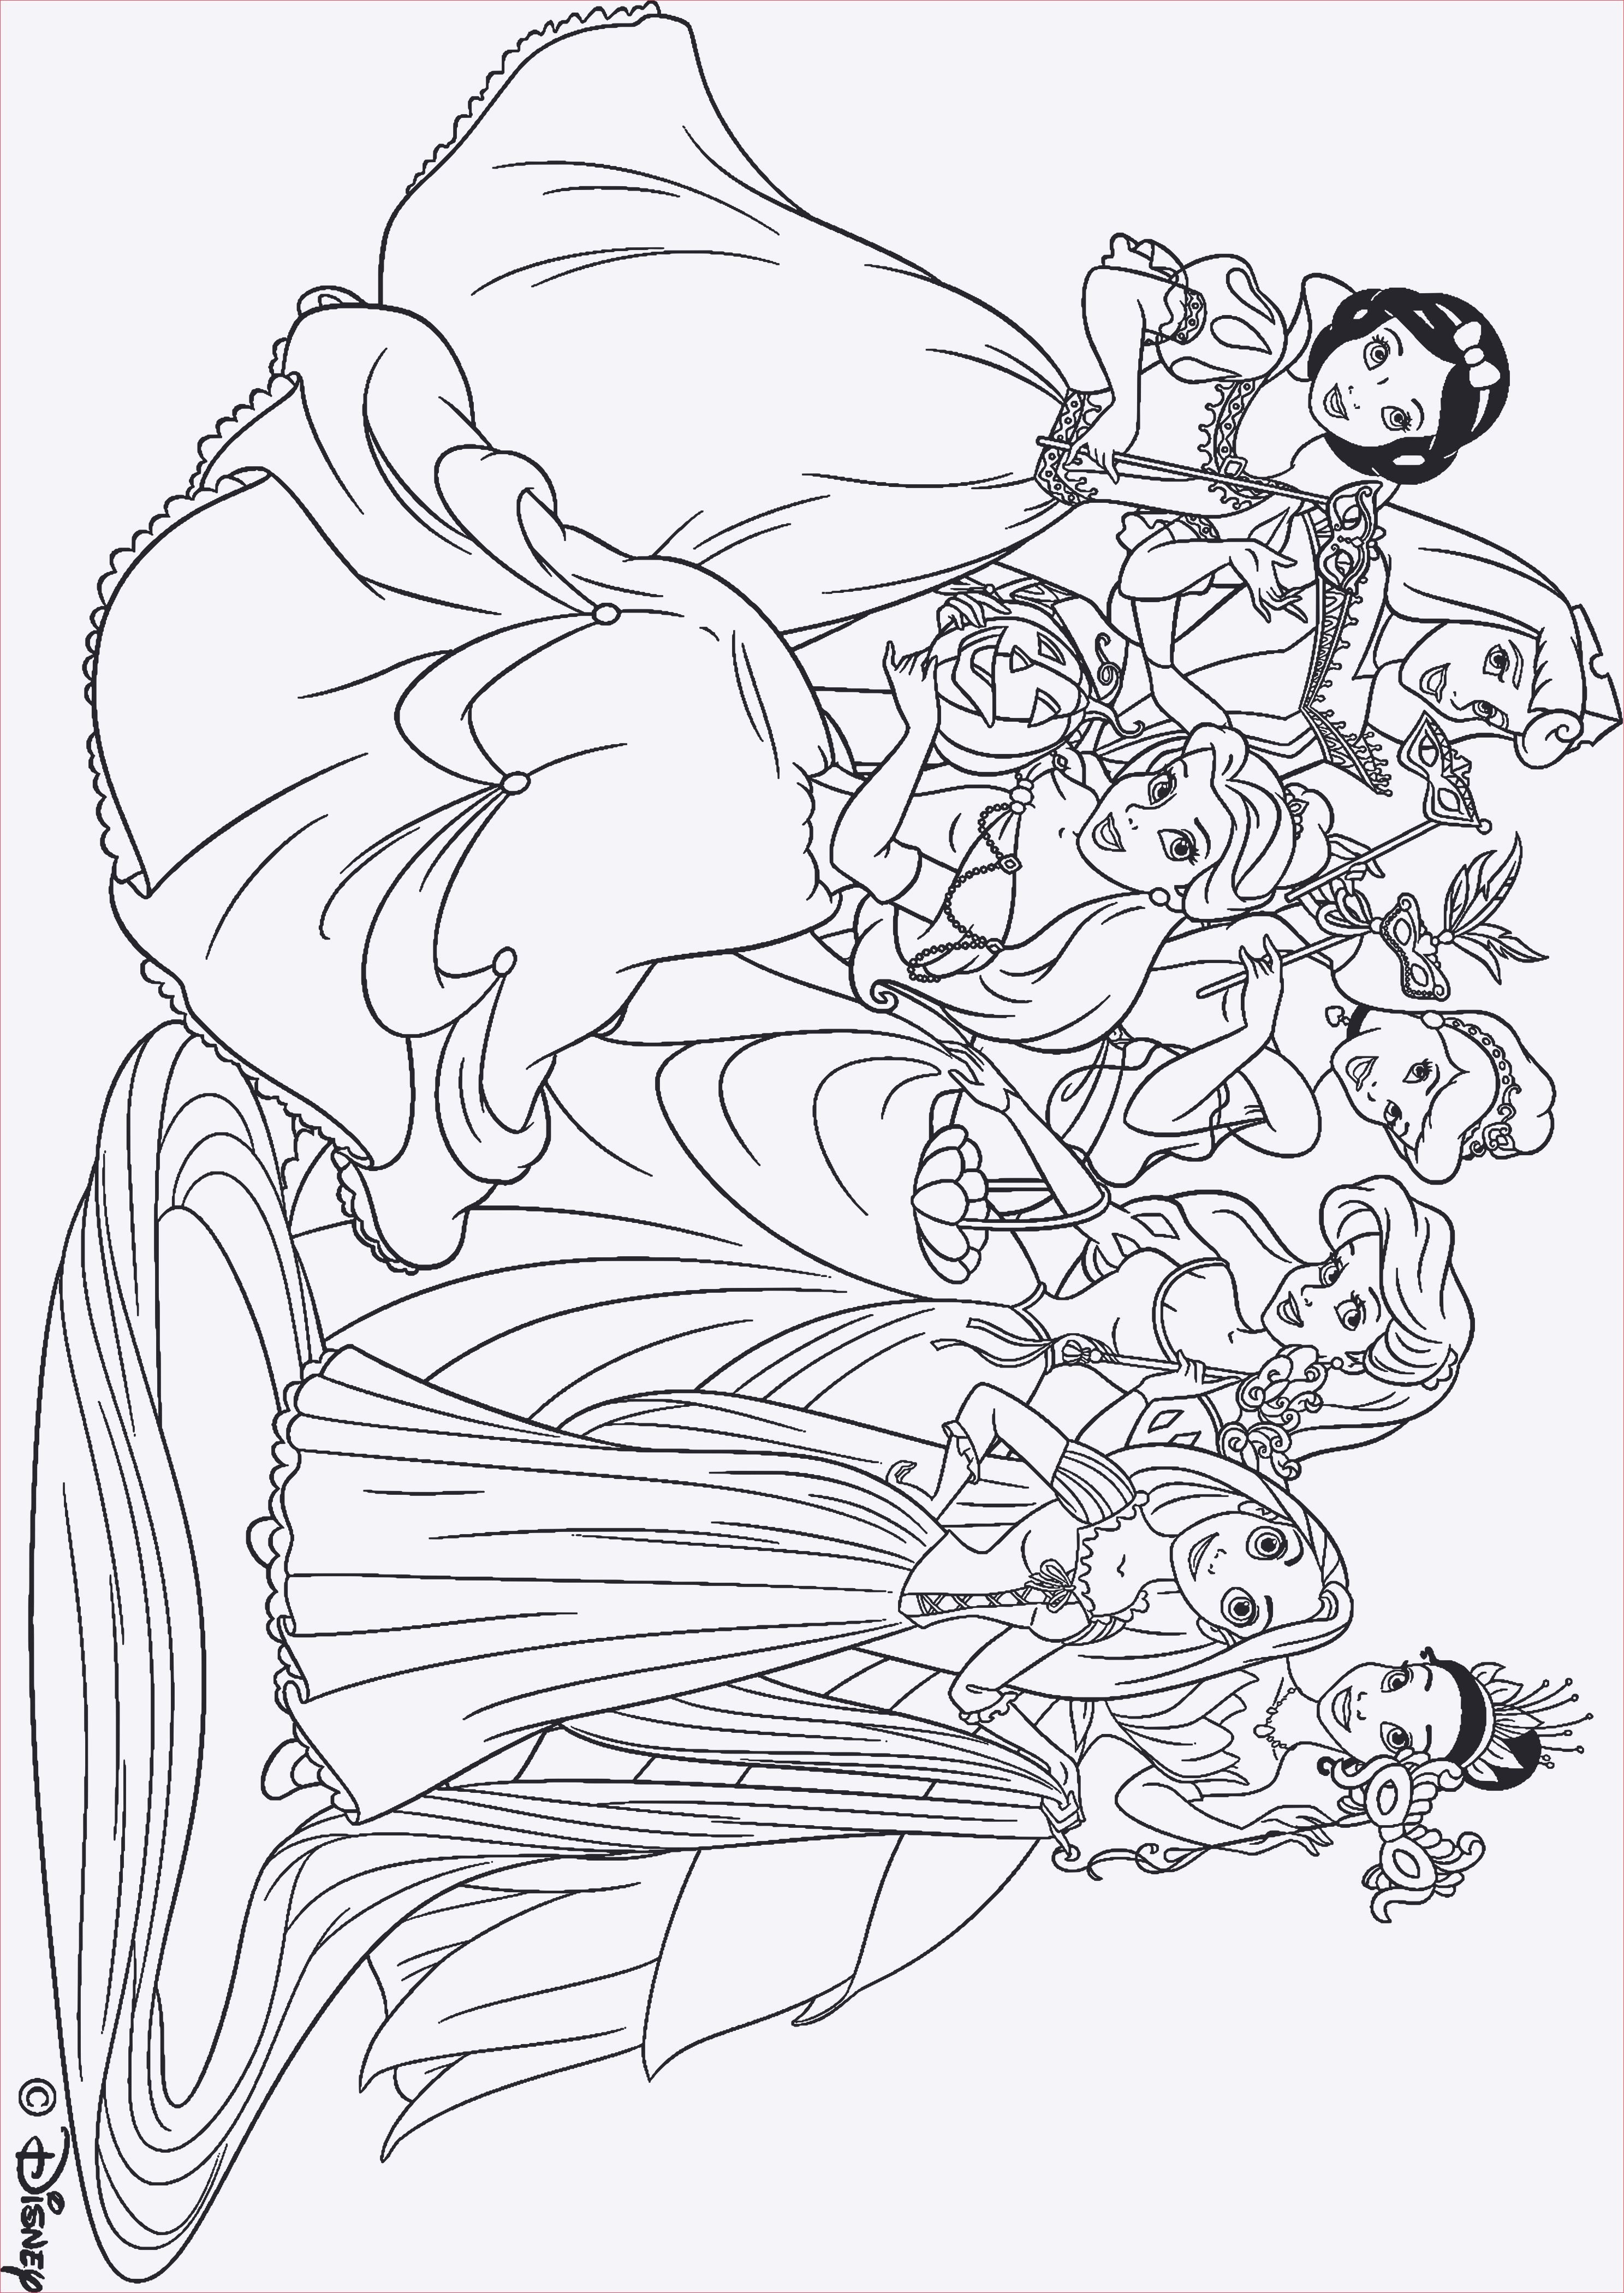 Ausmalbilder Disney Prinzessin Neu 35 Disney Prinzessin Ausmalbilder Scoredatscore Schön Disney Bild